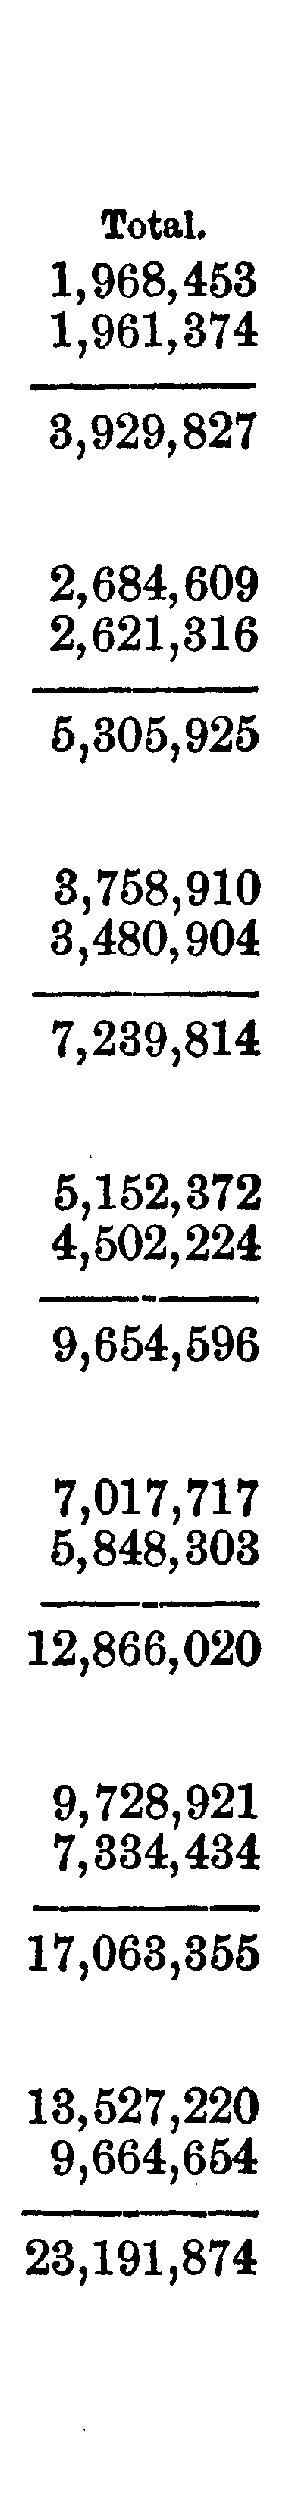 [merged small][merged small][merged small][merged small][merged small][ocr errors][ocr errors][ocr errors][ocr errors][ocr errors][merged small][ocr errors][merged small][merged small][merged small]